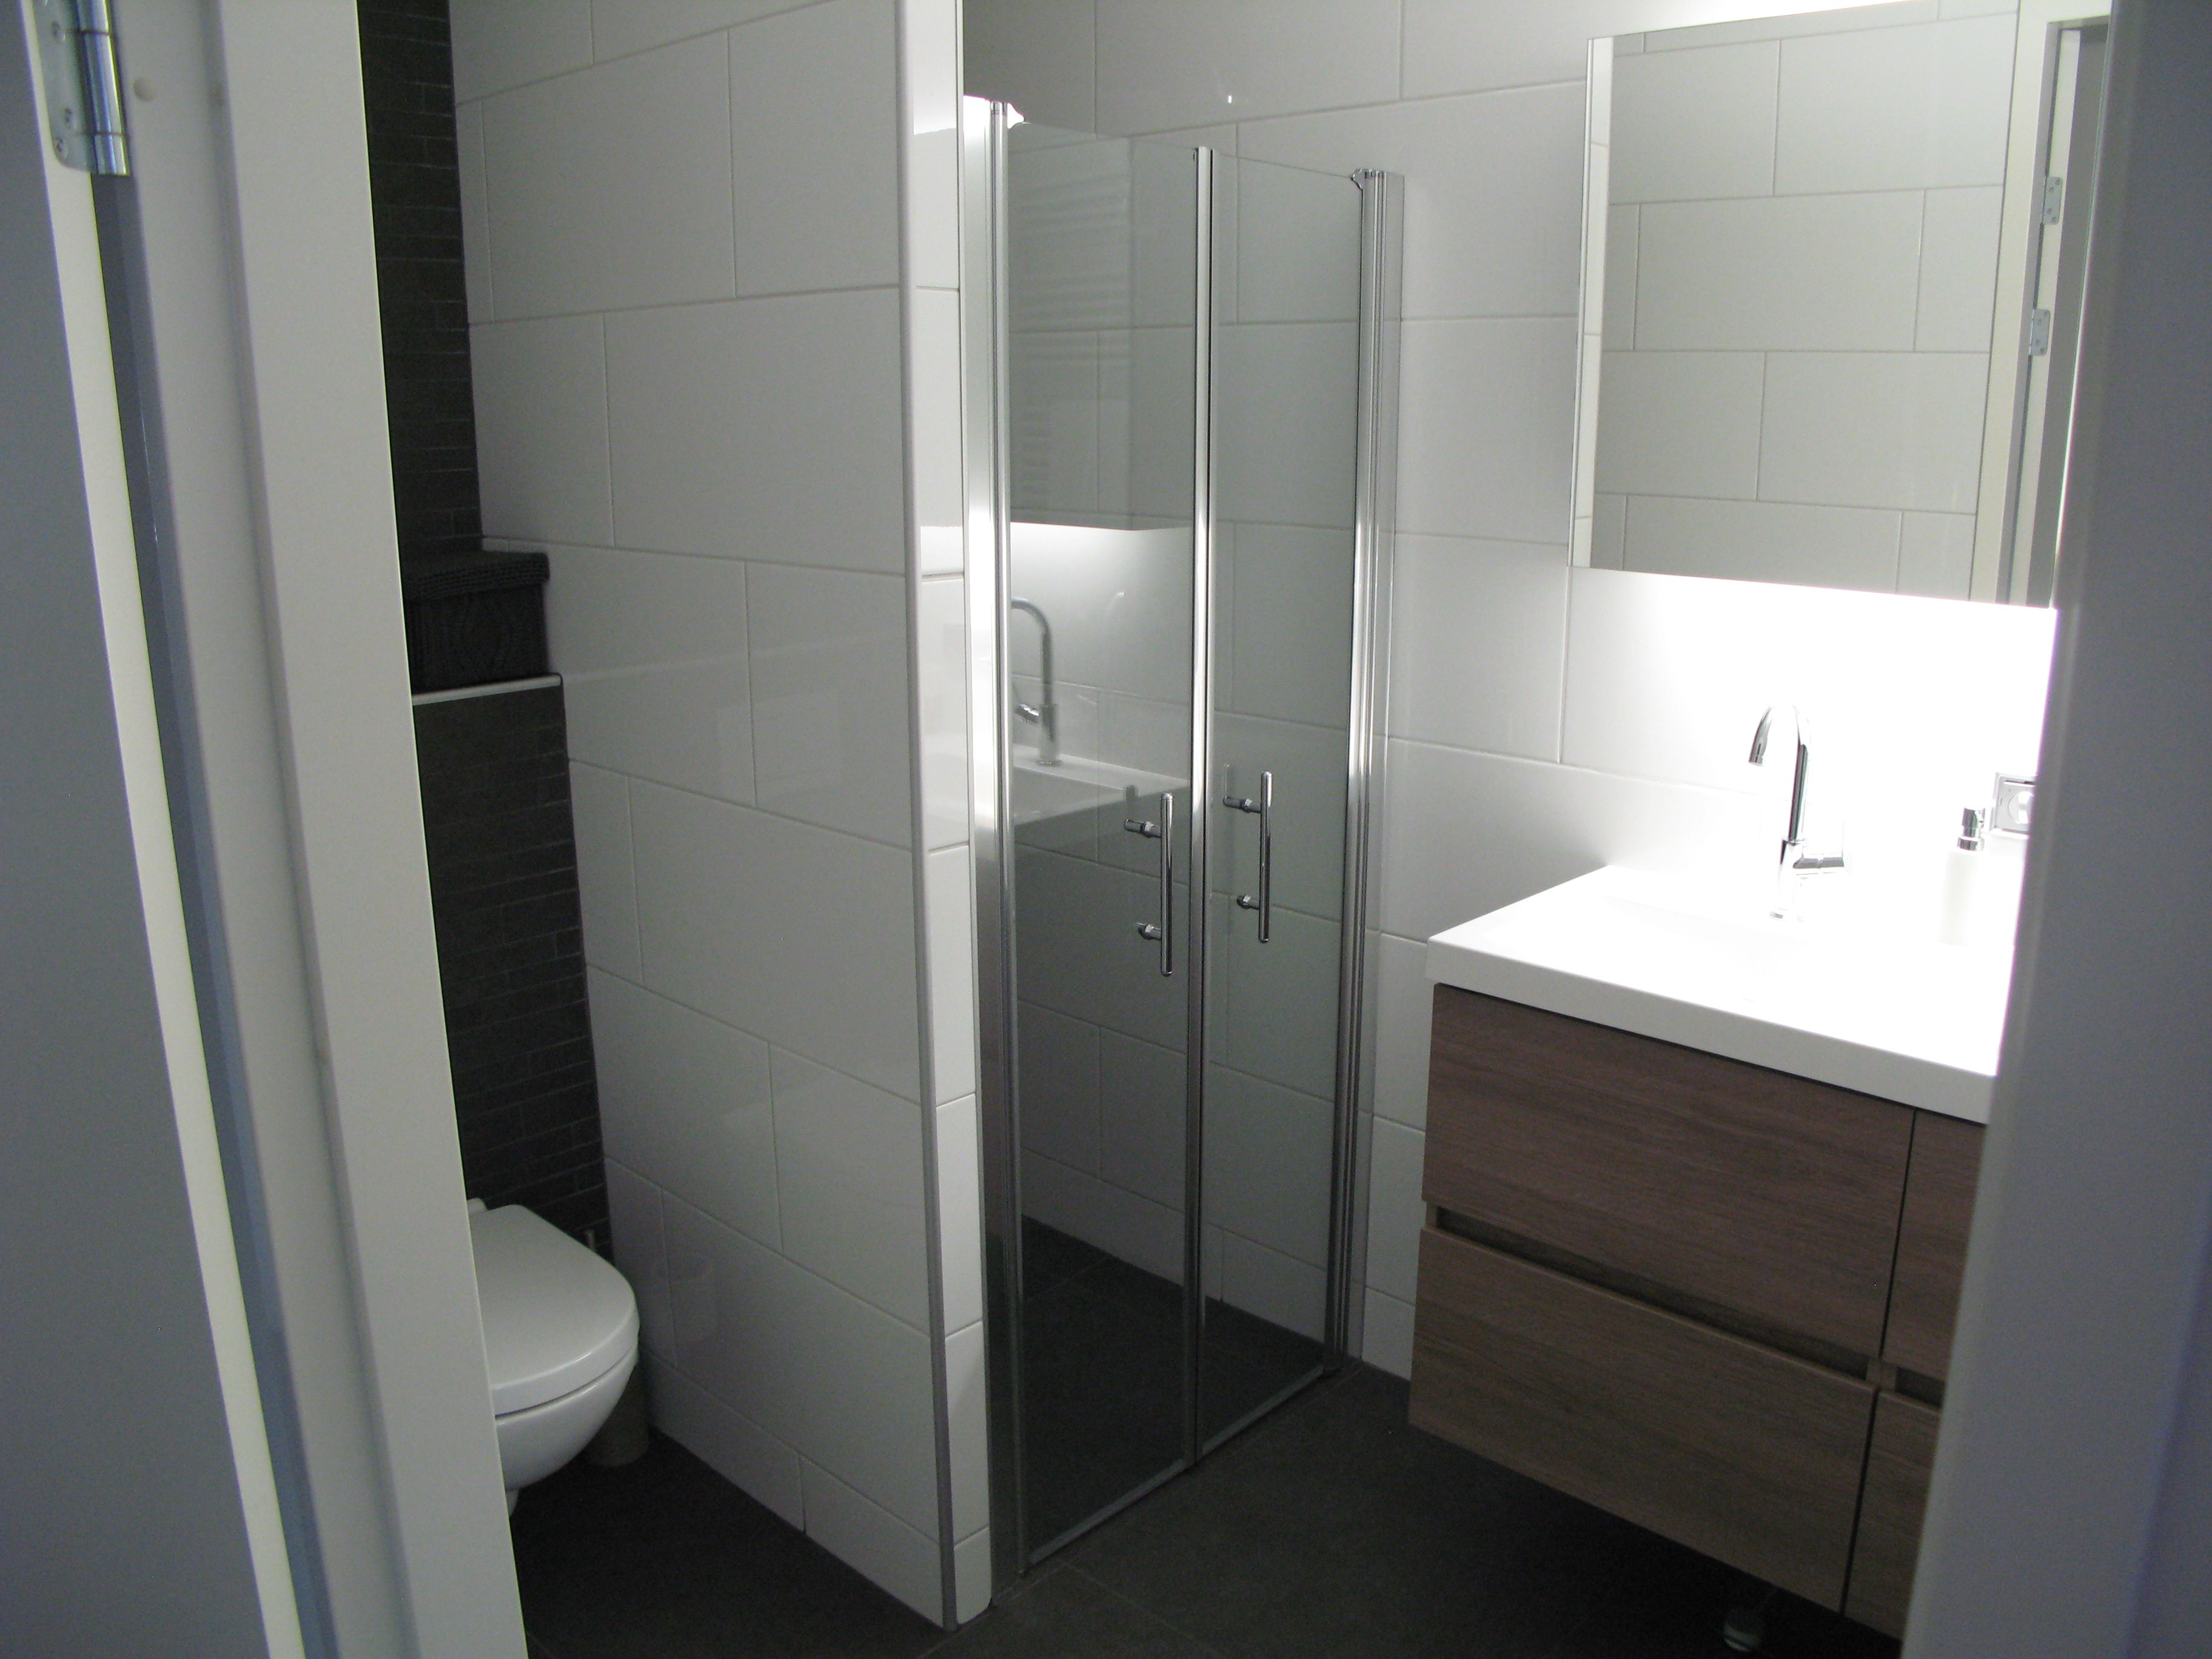 fam bax badkamer landelijke badkamers pinterest